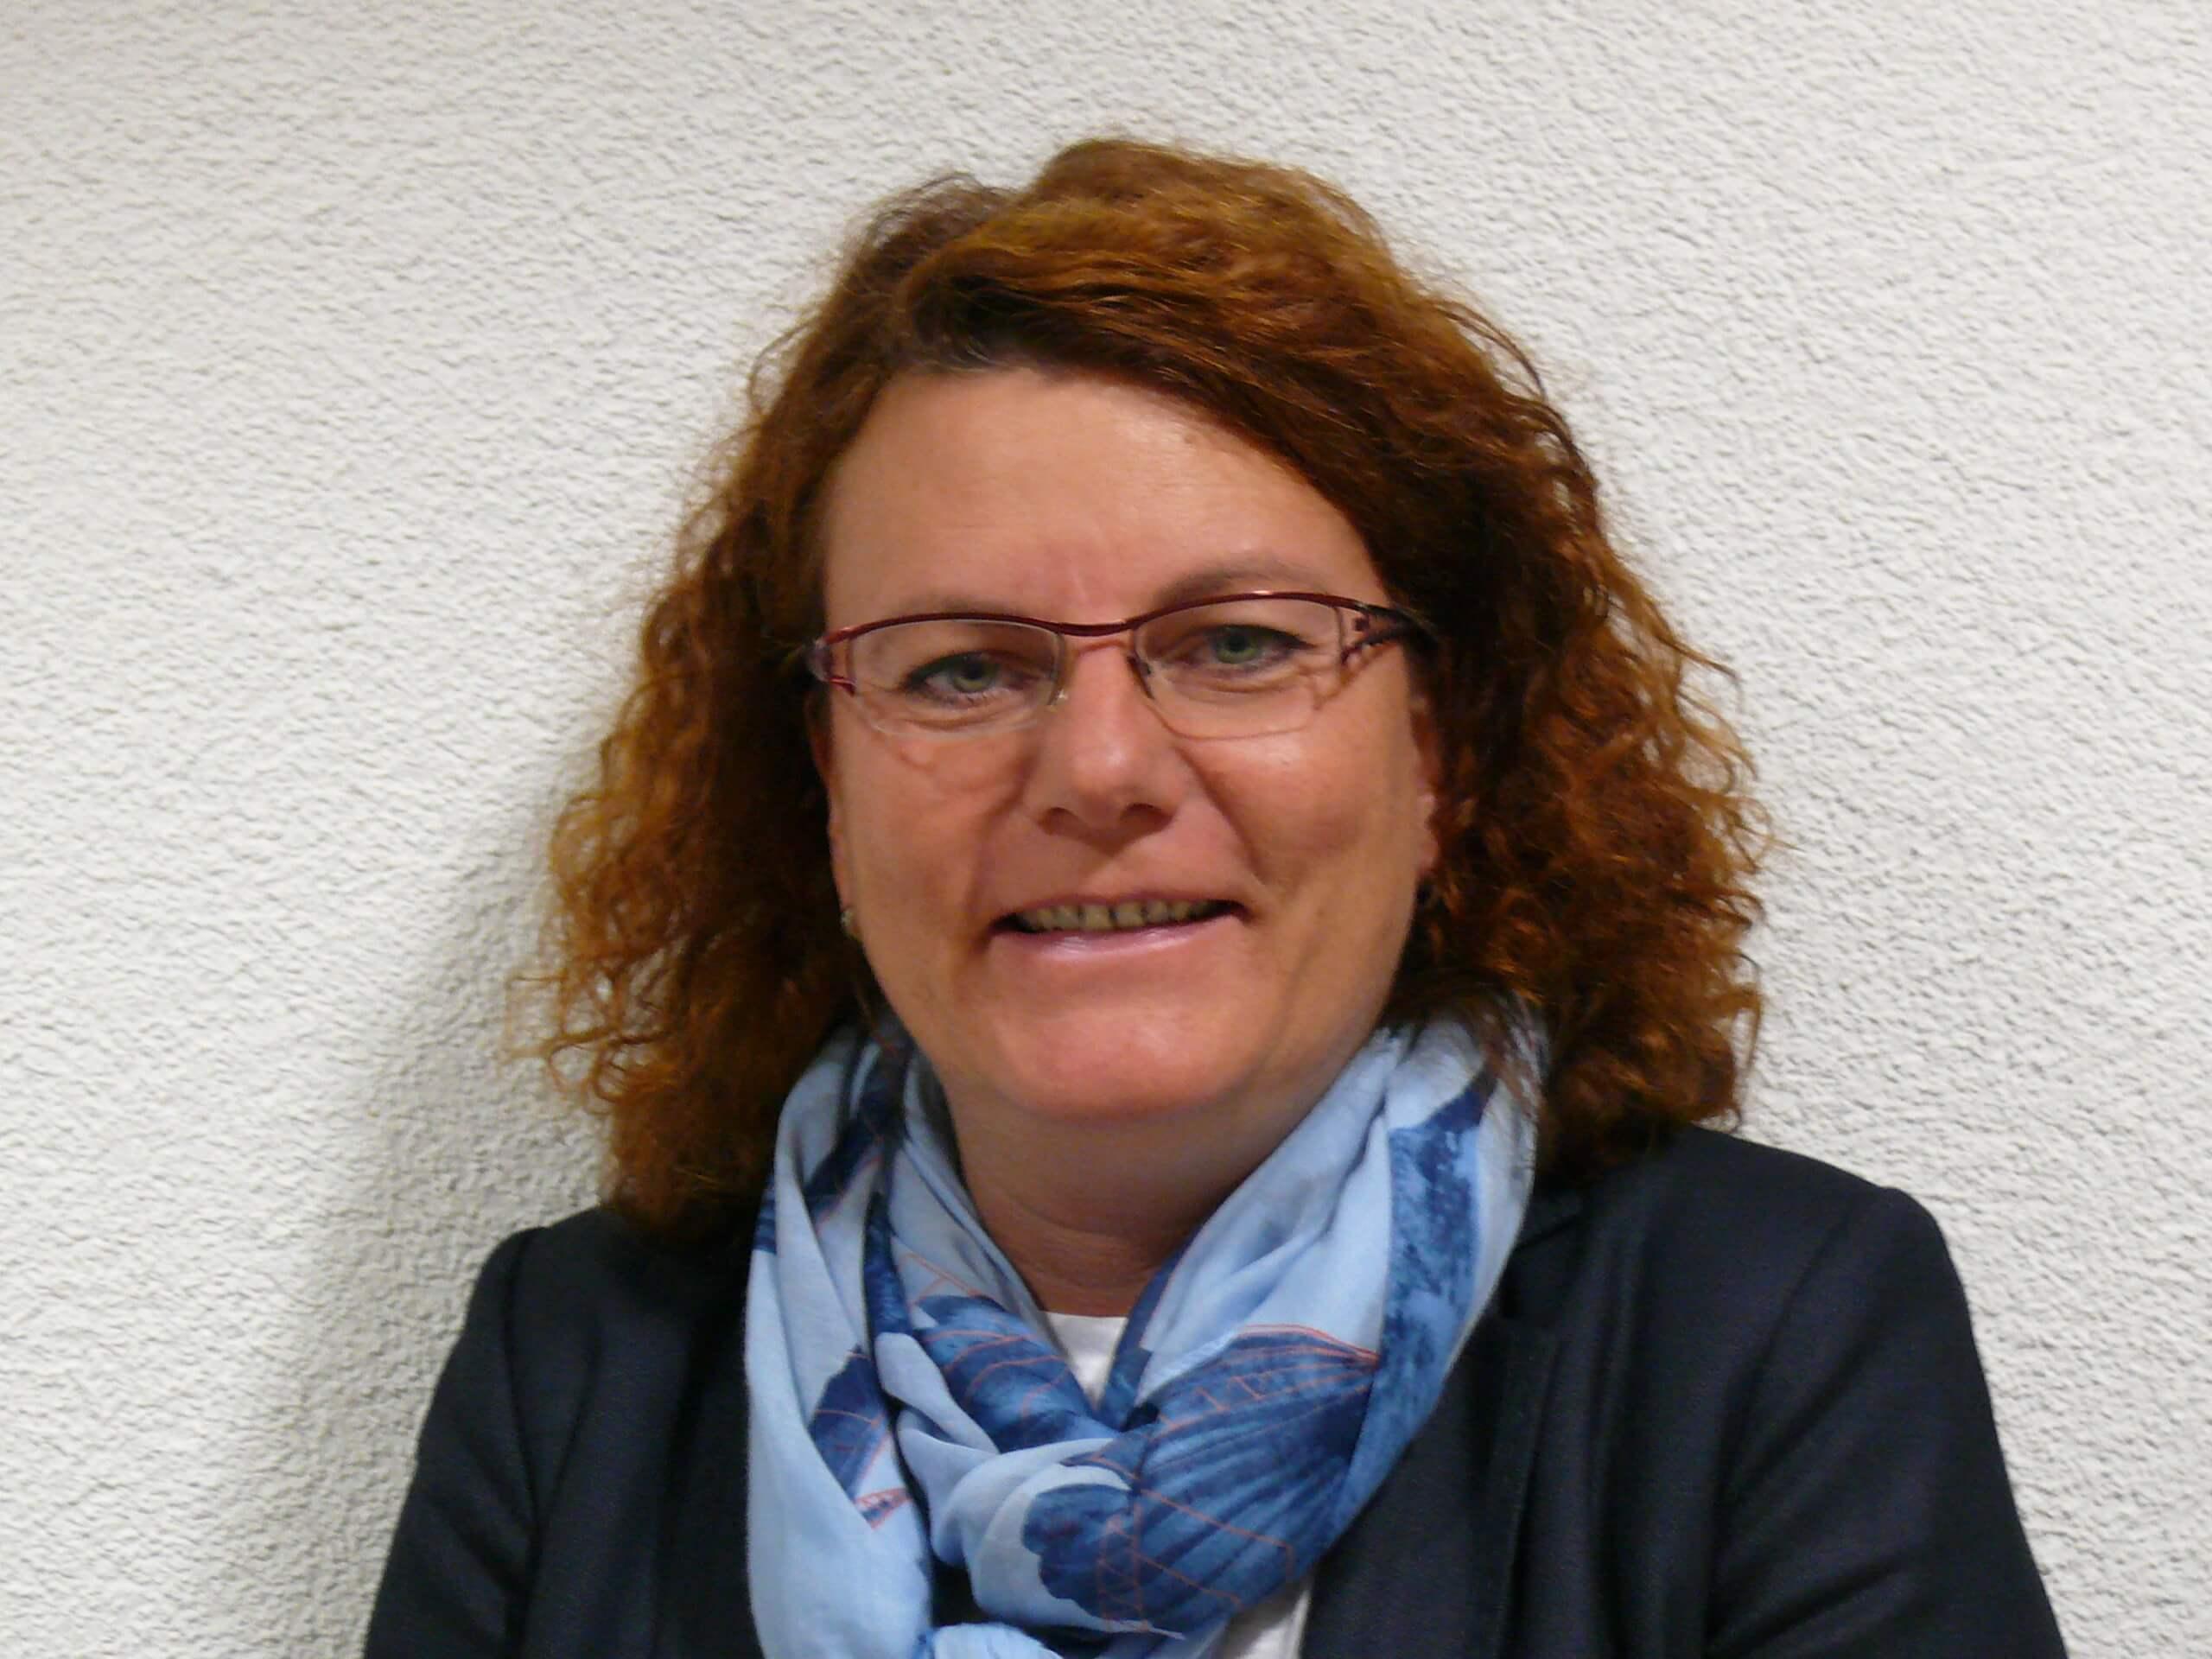 Ursula Sammel